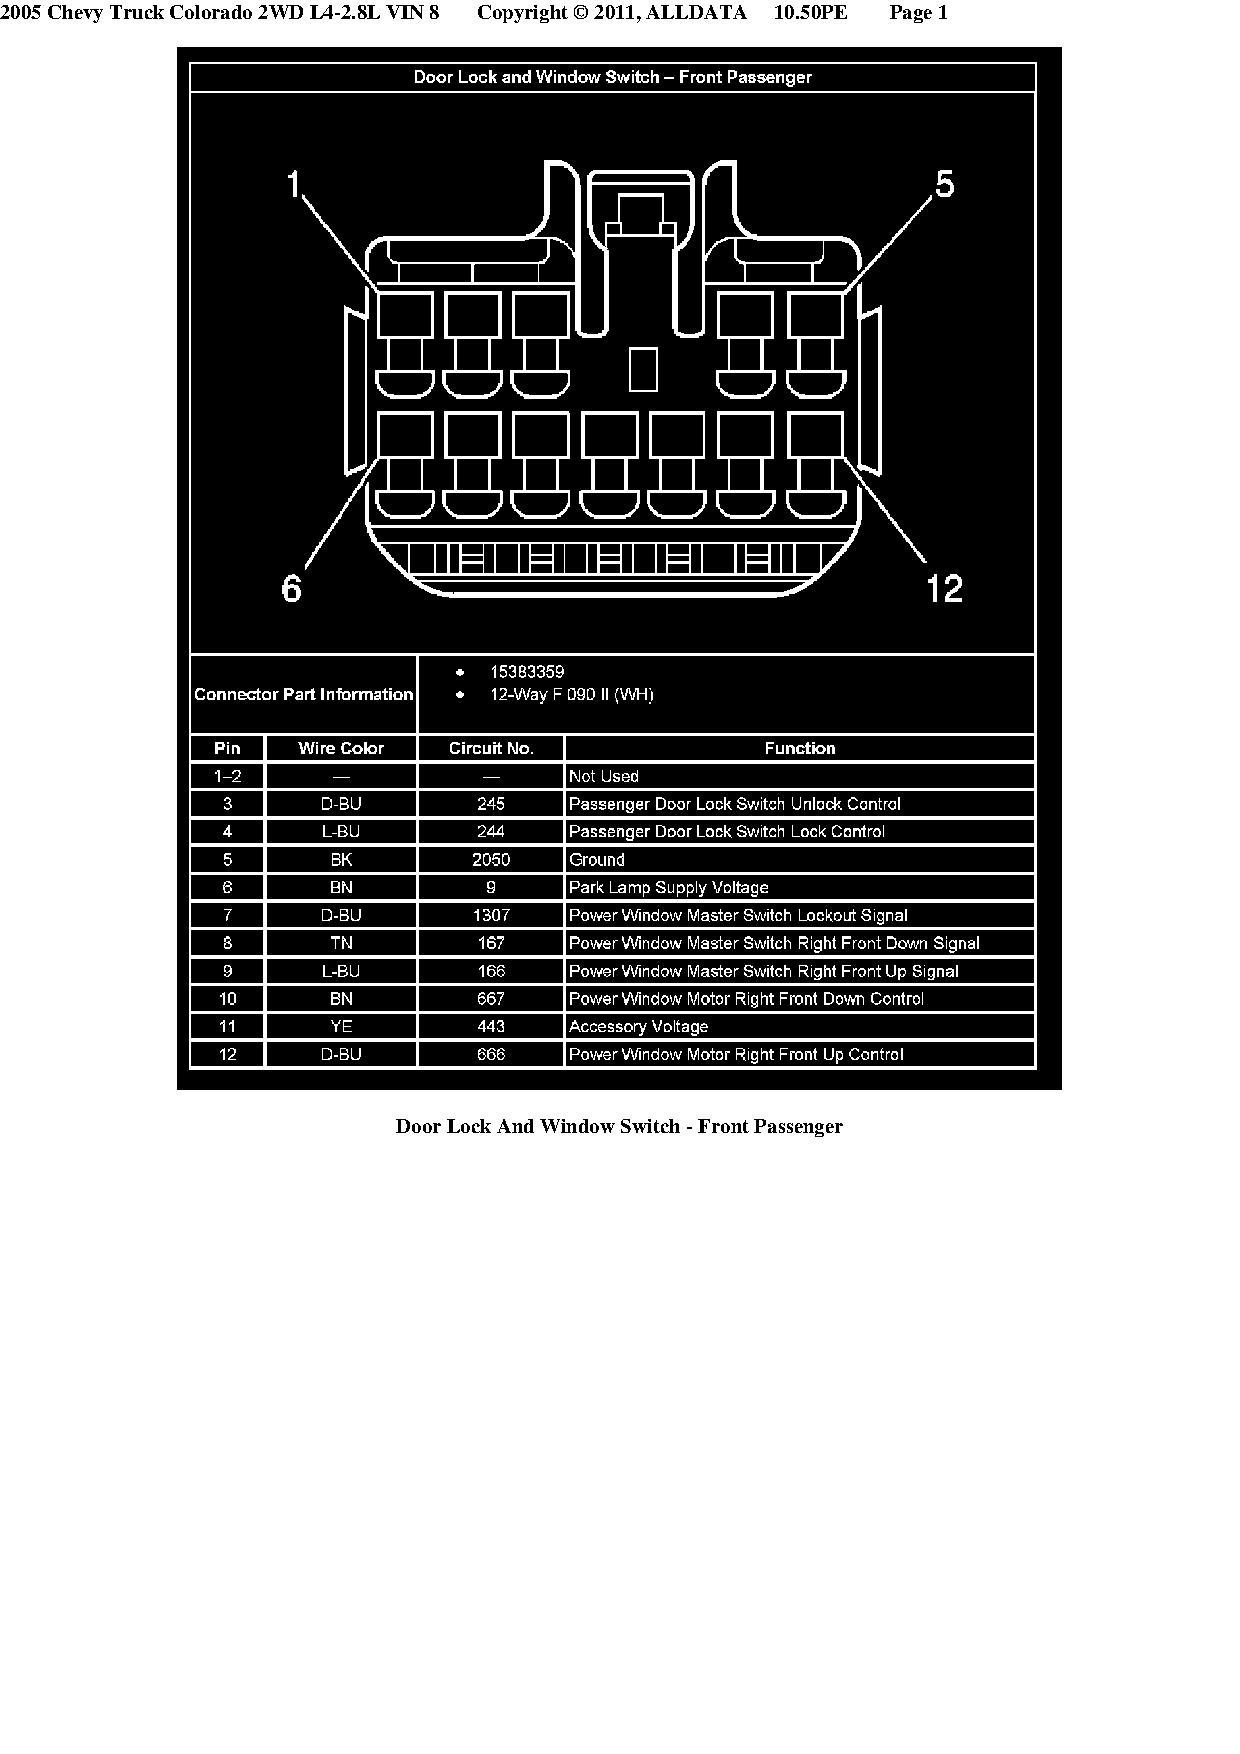 2002 chevy venture fuse box diagram vtwctr 02 mercury sable fuse box power window wiring diagram